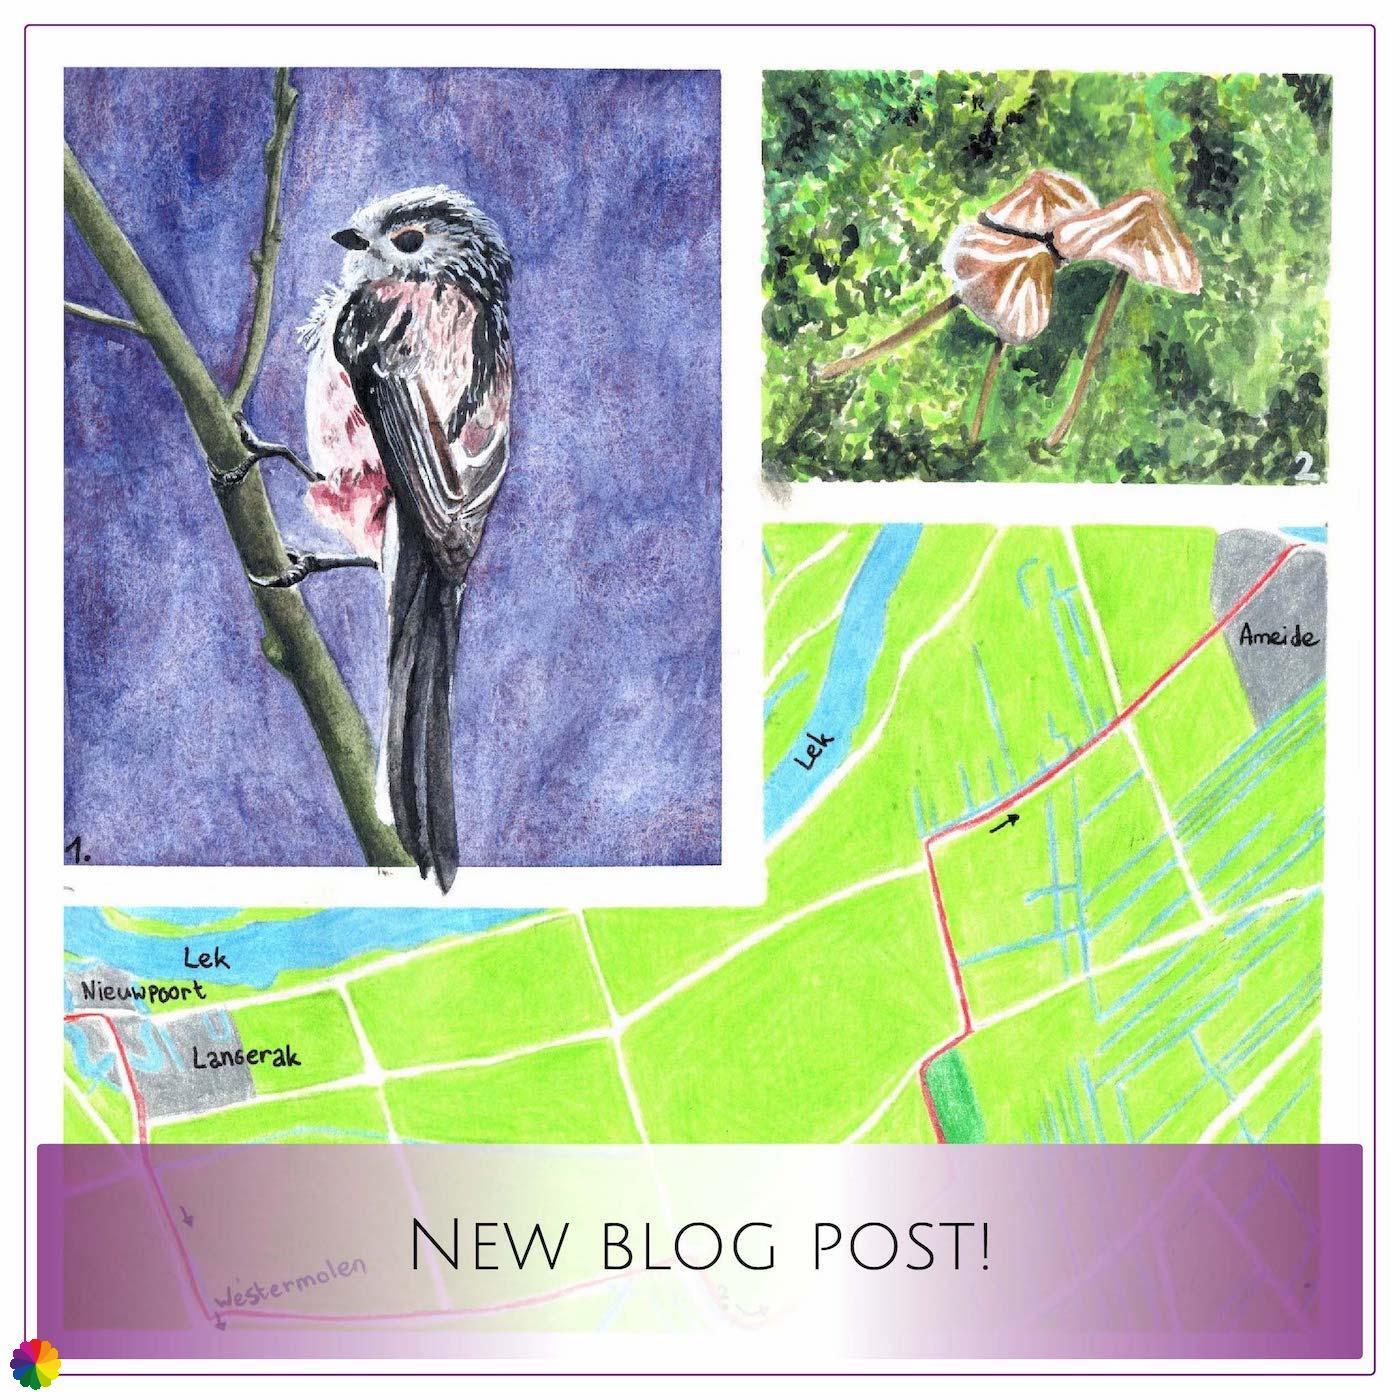 Blog-update Grote rivierenpad Nieuwpoort - Ameide